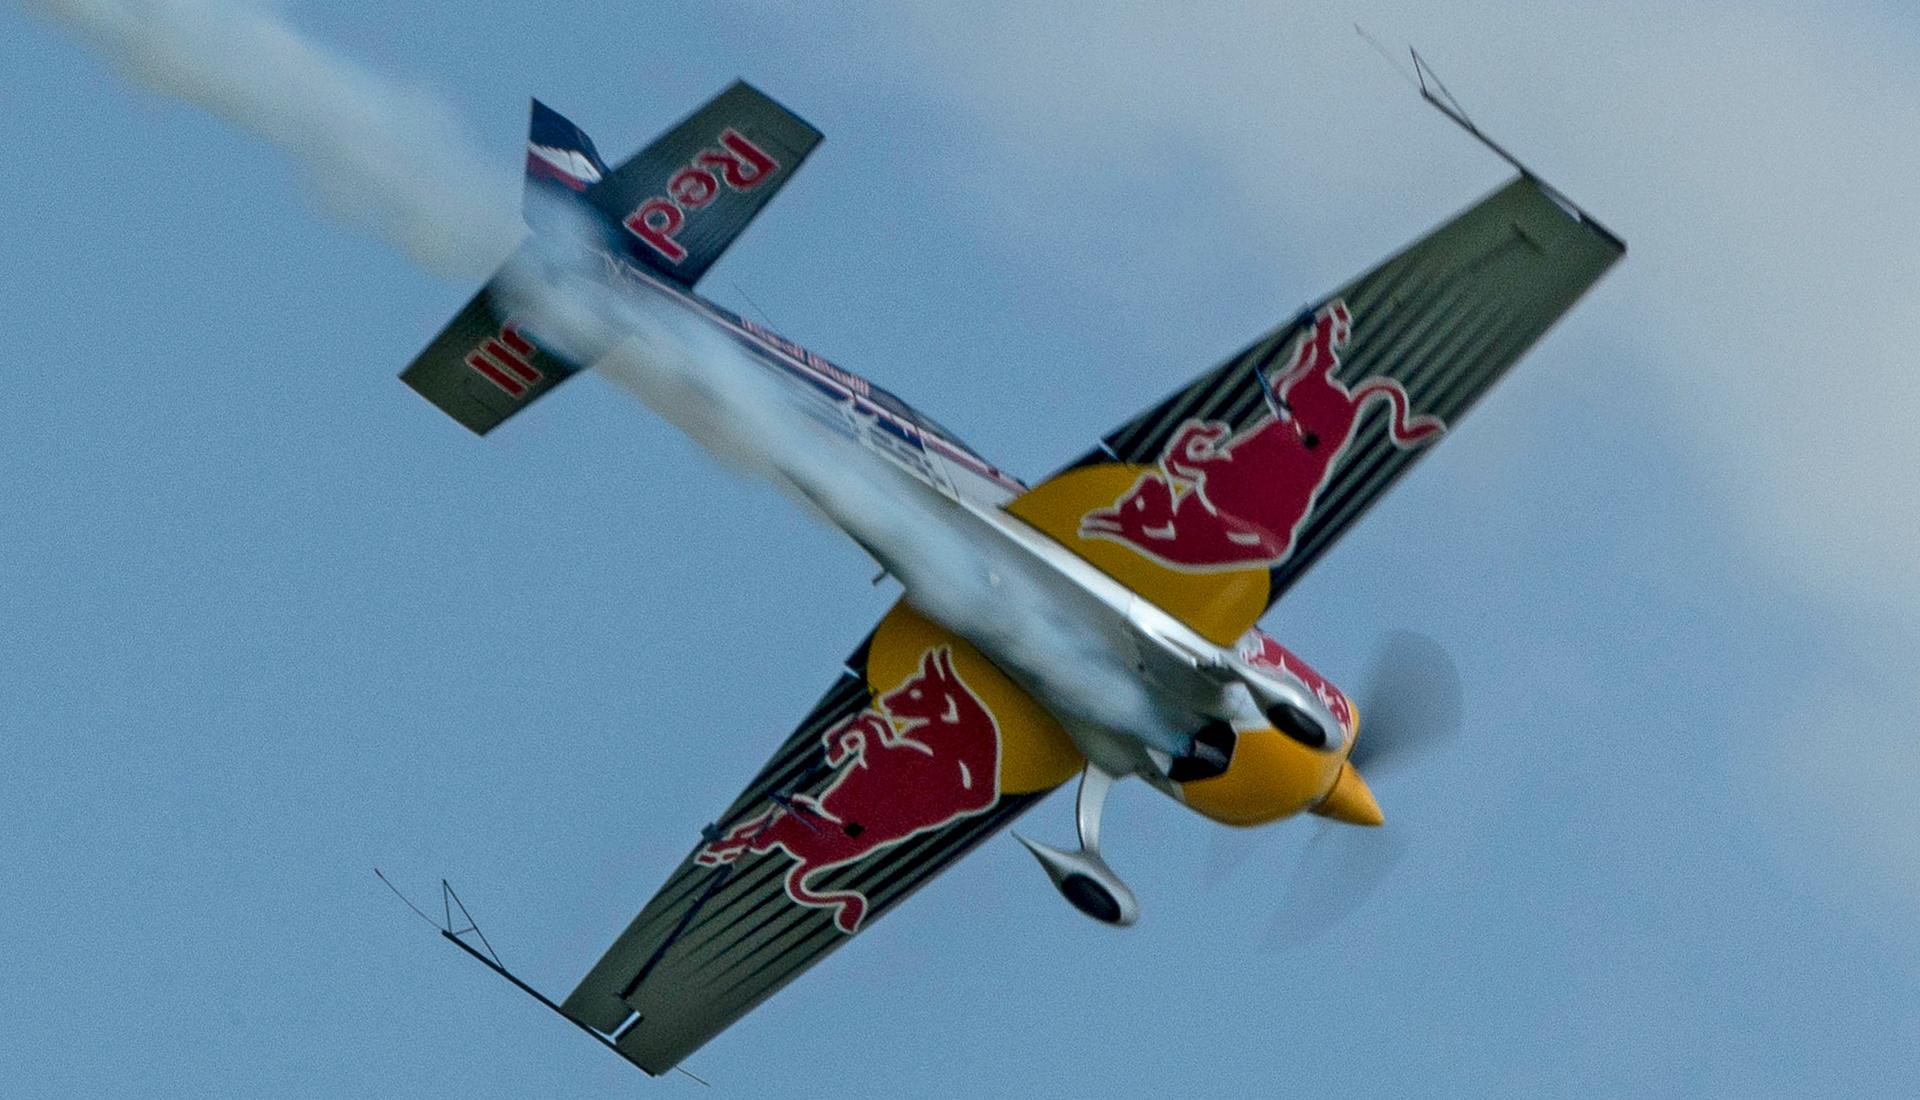 2-XtremeAir-XA42-letova-fotografie-miroslav-kamrla-1920x1110_6.jpg